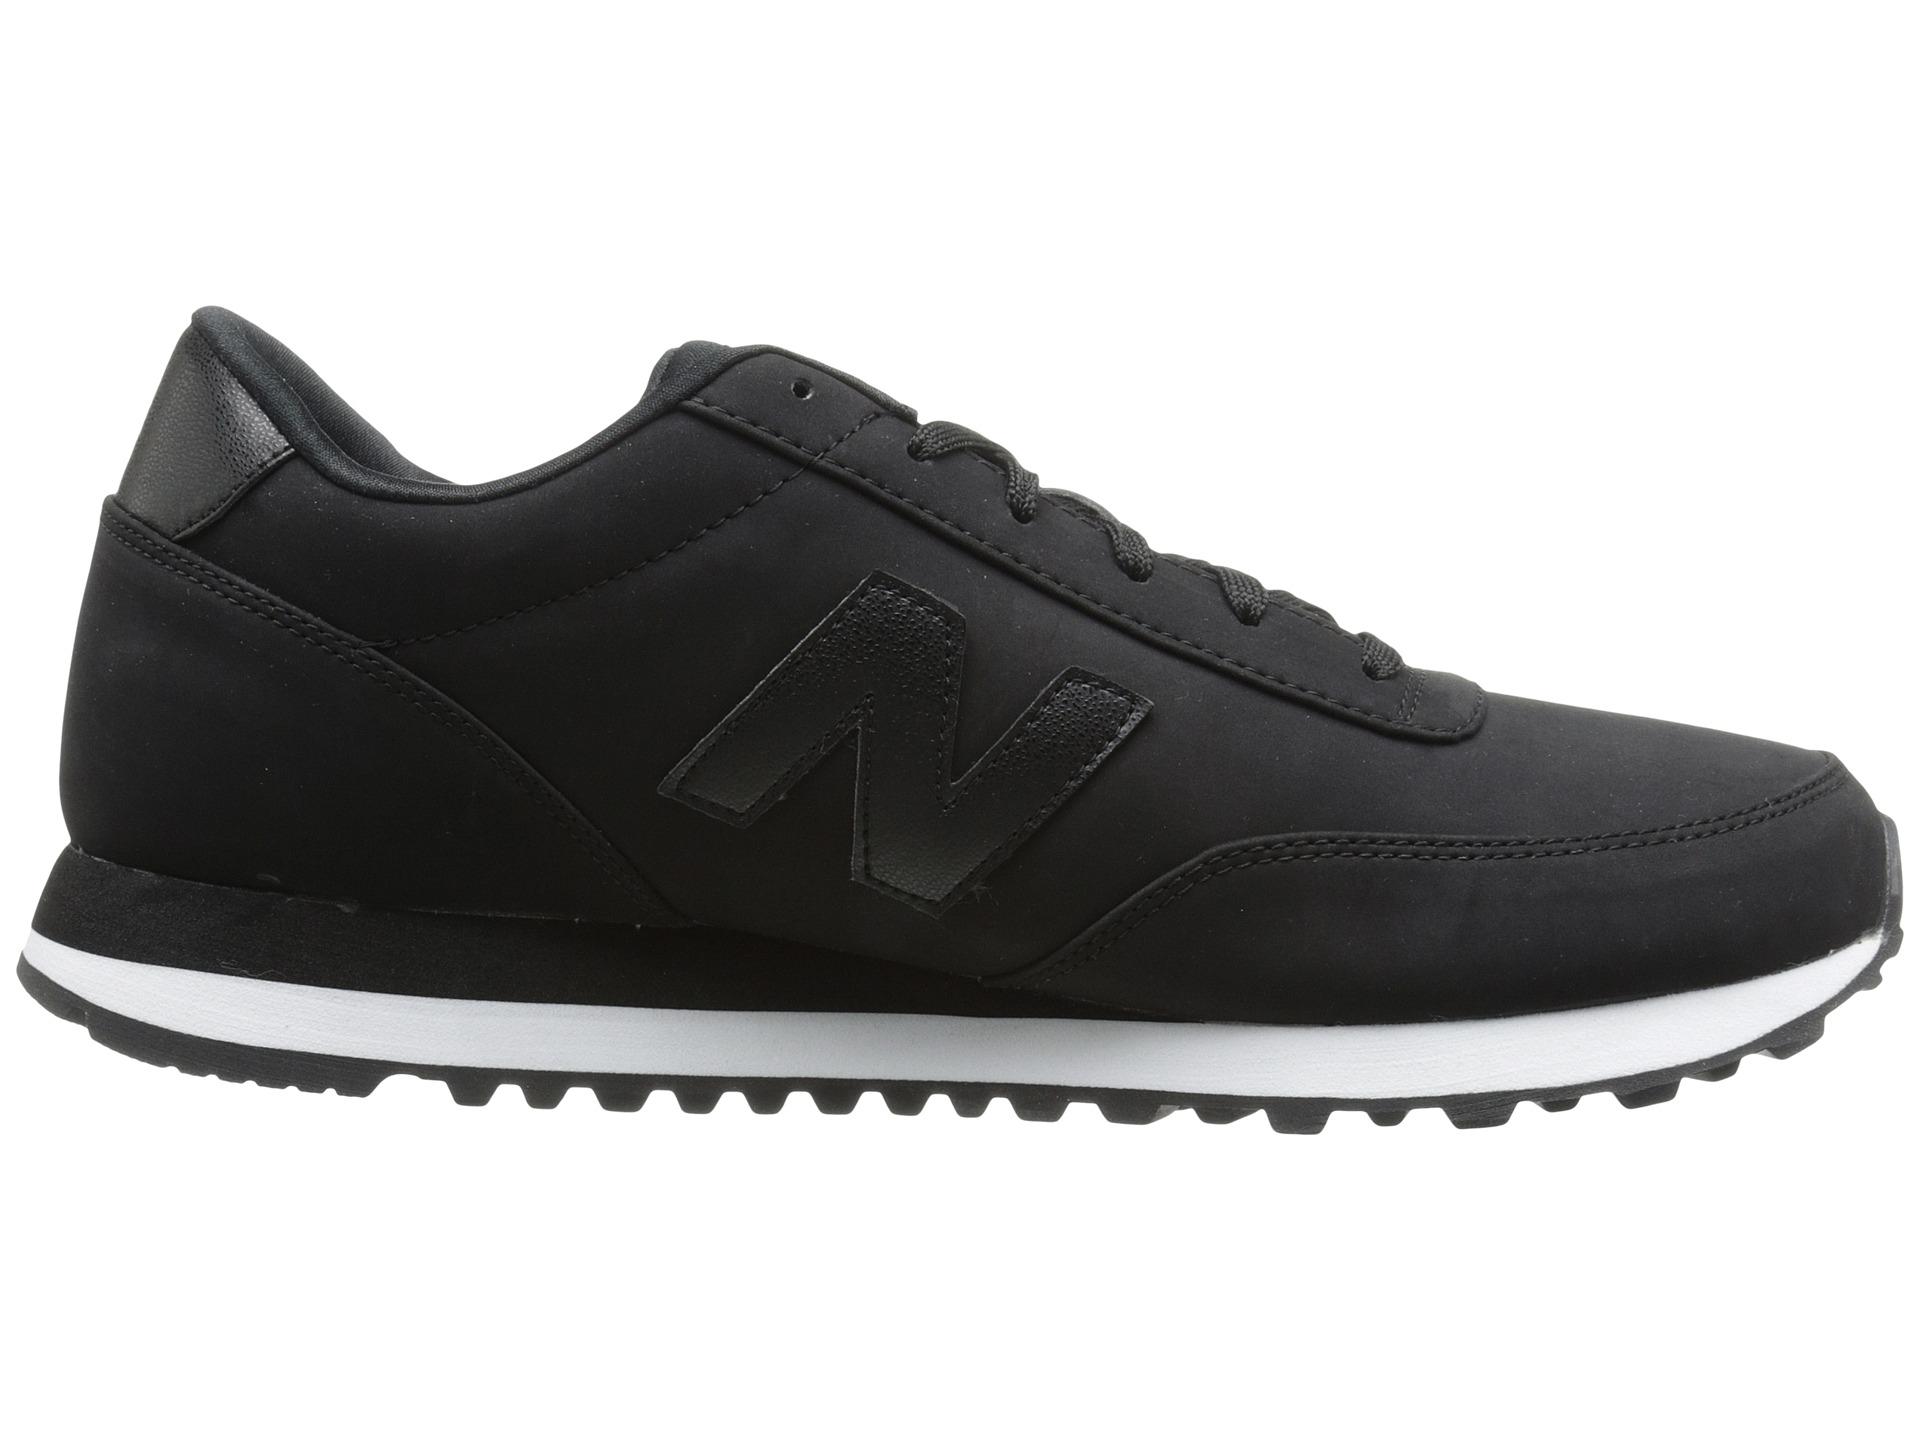 womens new balance 574 high roller athletic shoe black monochrome